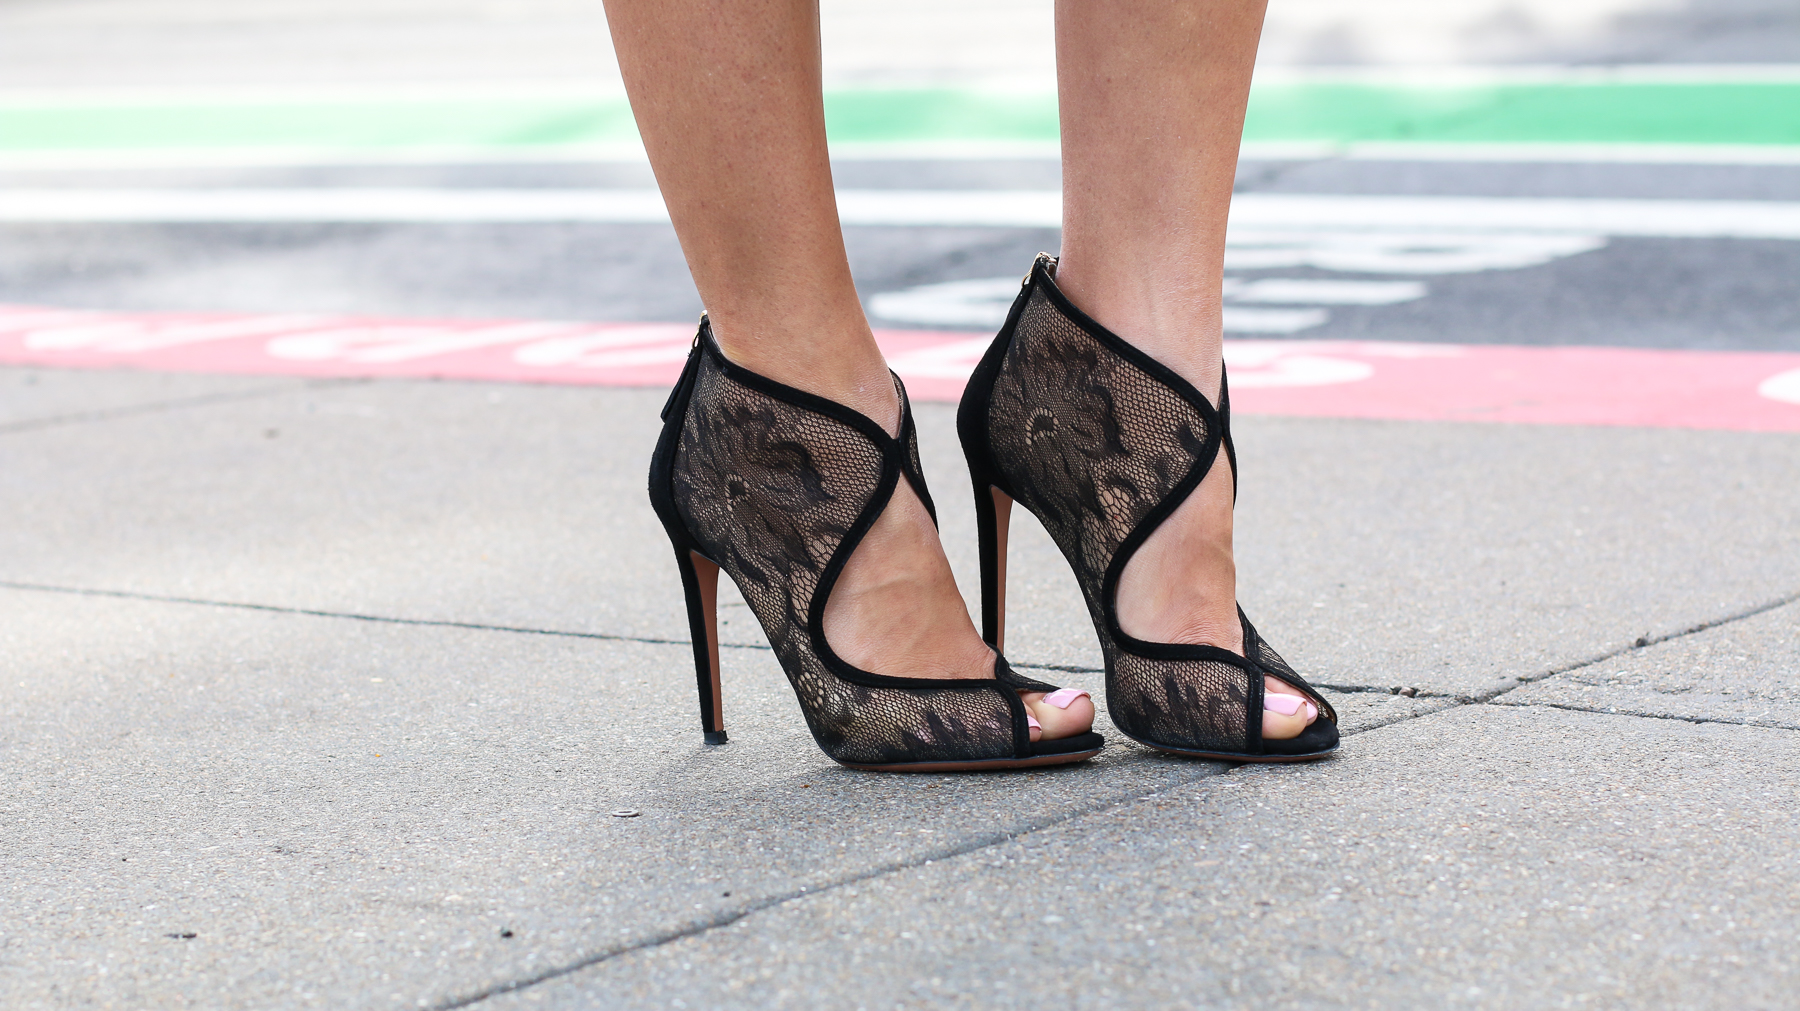 Ariana Lauren Fashion Born Fashion Blogger San Francisco Streetstyle Photography by Ryan Chua-6130